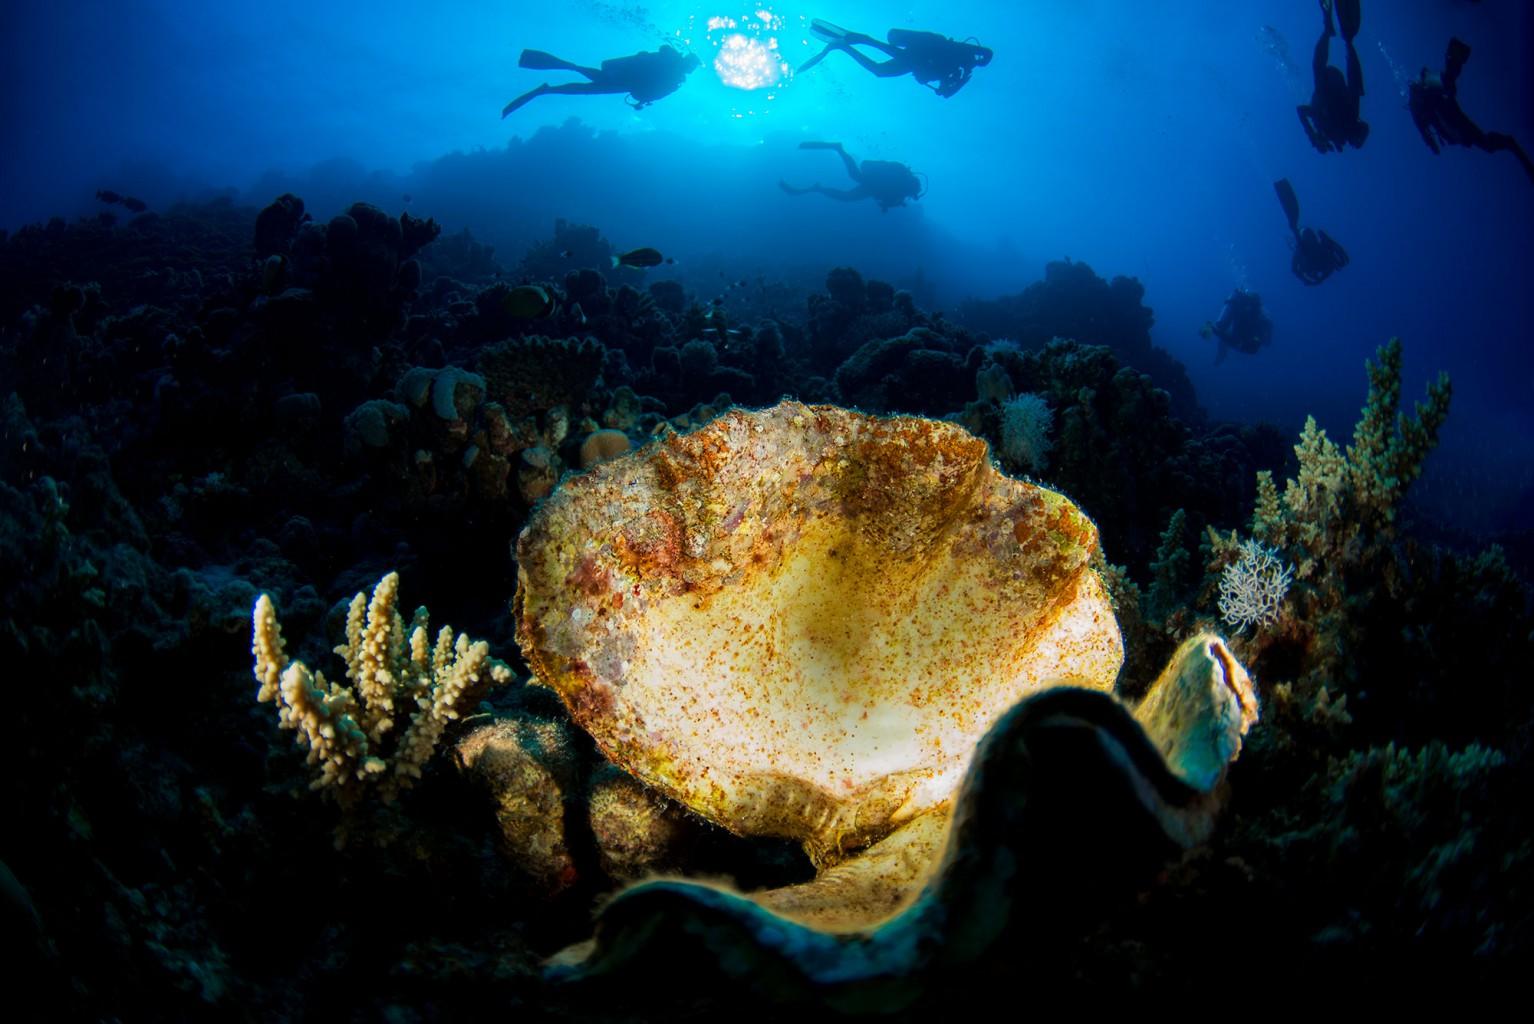 Marsa Shagra Reef, Red Sea, Egypt